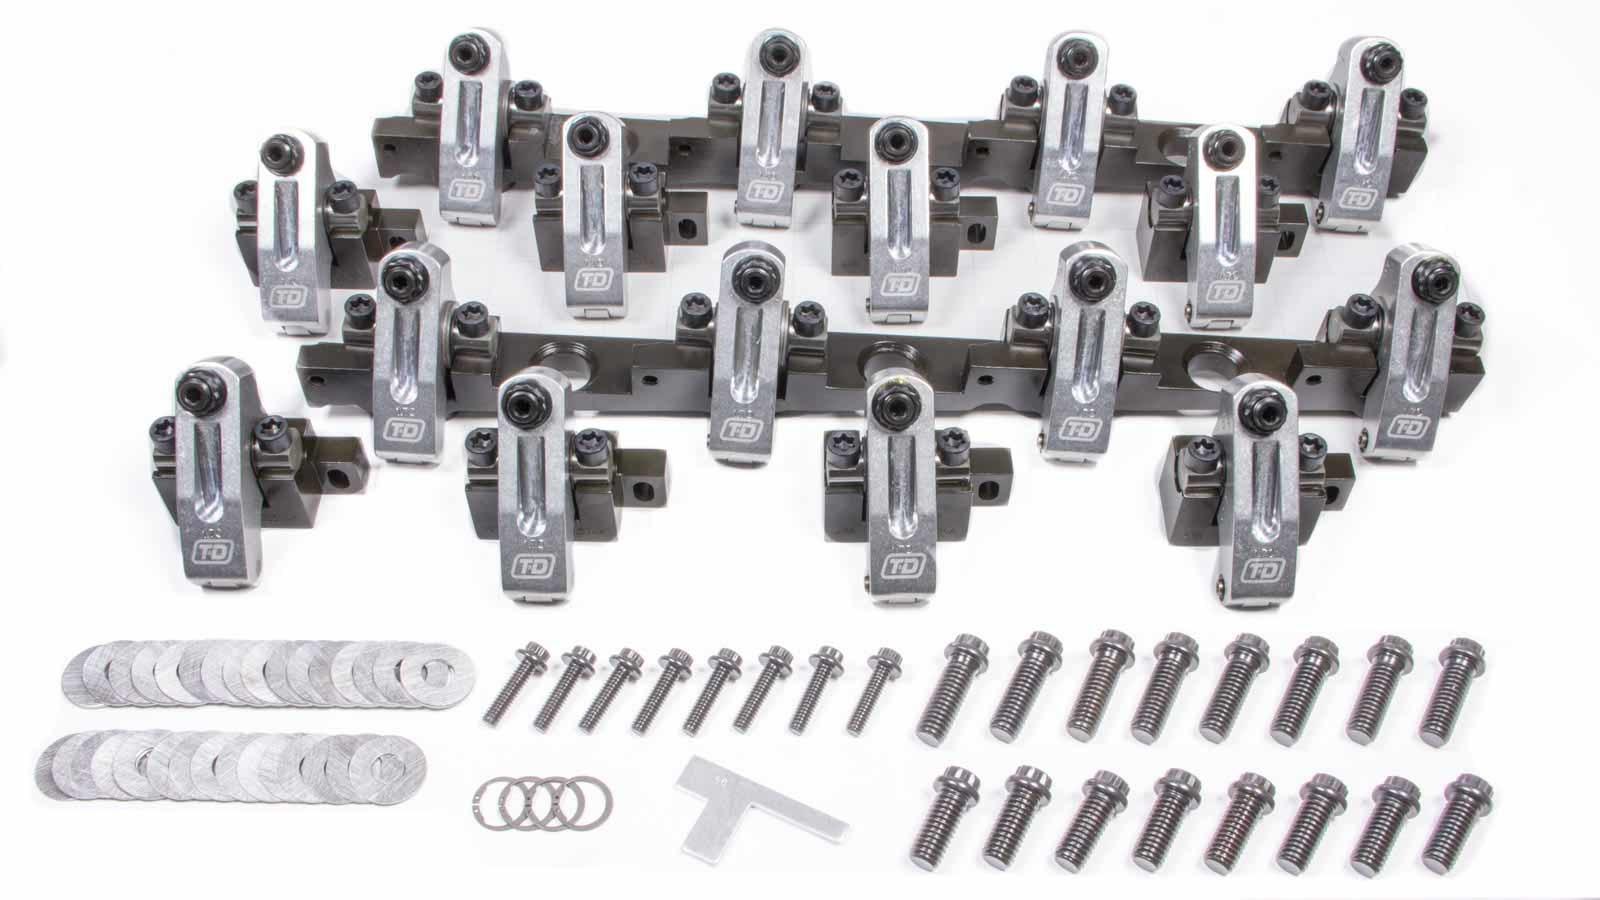 T&D Machine 3104-170/170 Rocker Arm, Shaft Mount, 1.70 Ratio, Full Roller, Aluminum, Natural, Brodix 2x / 2Xtra, Big Block Chevy, Kit